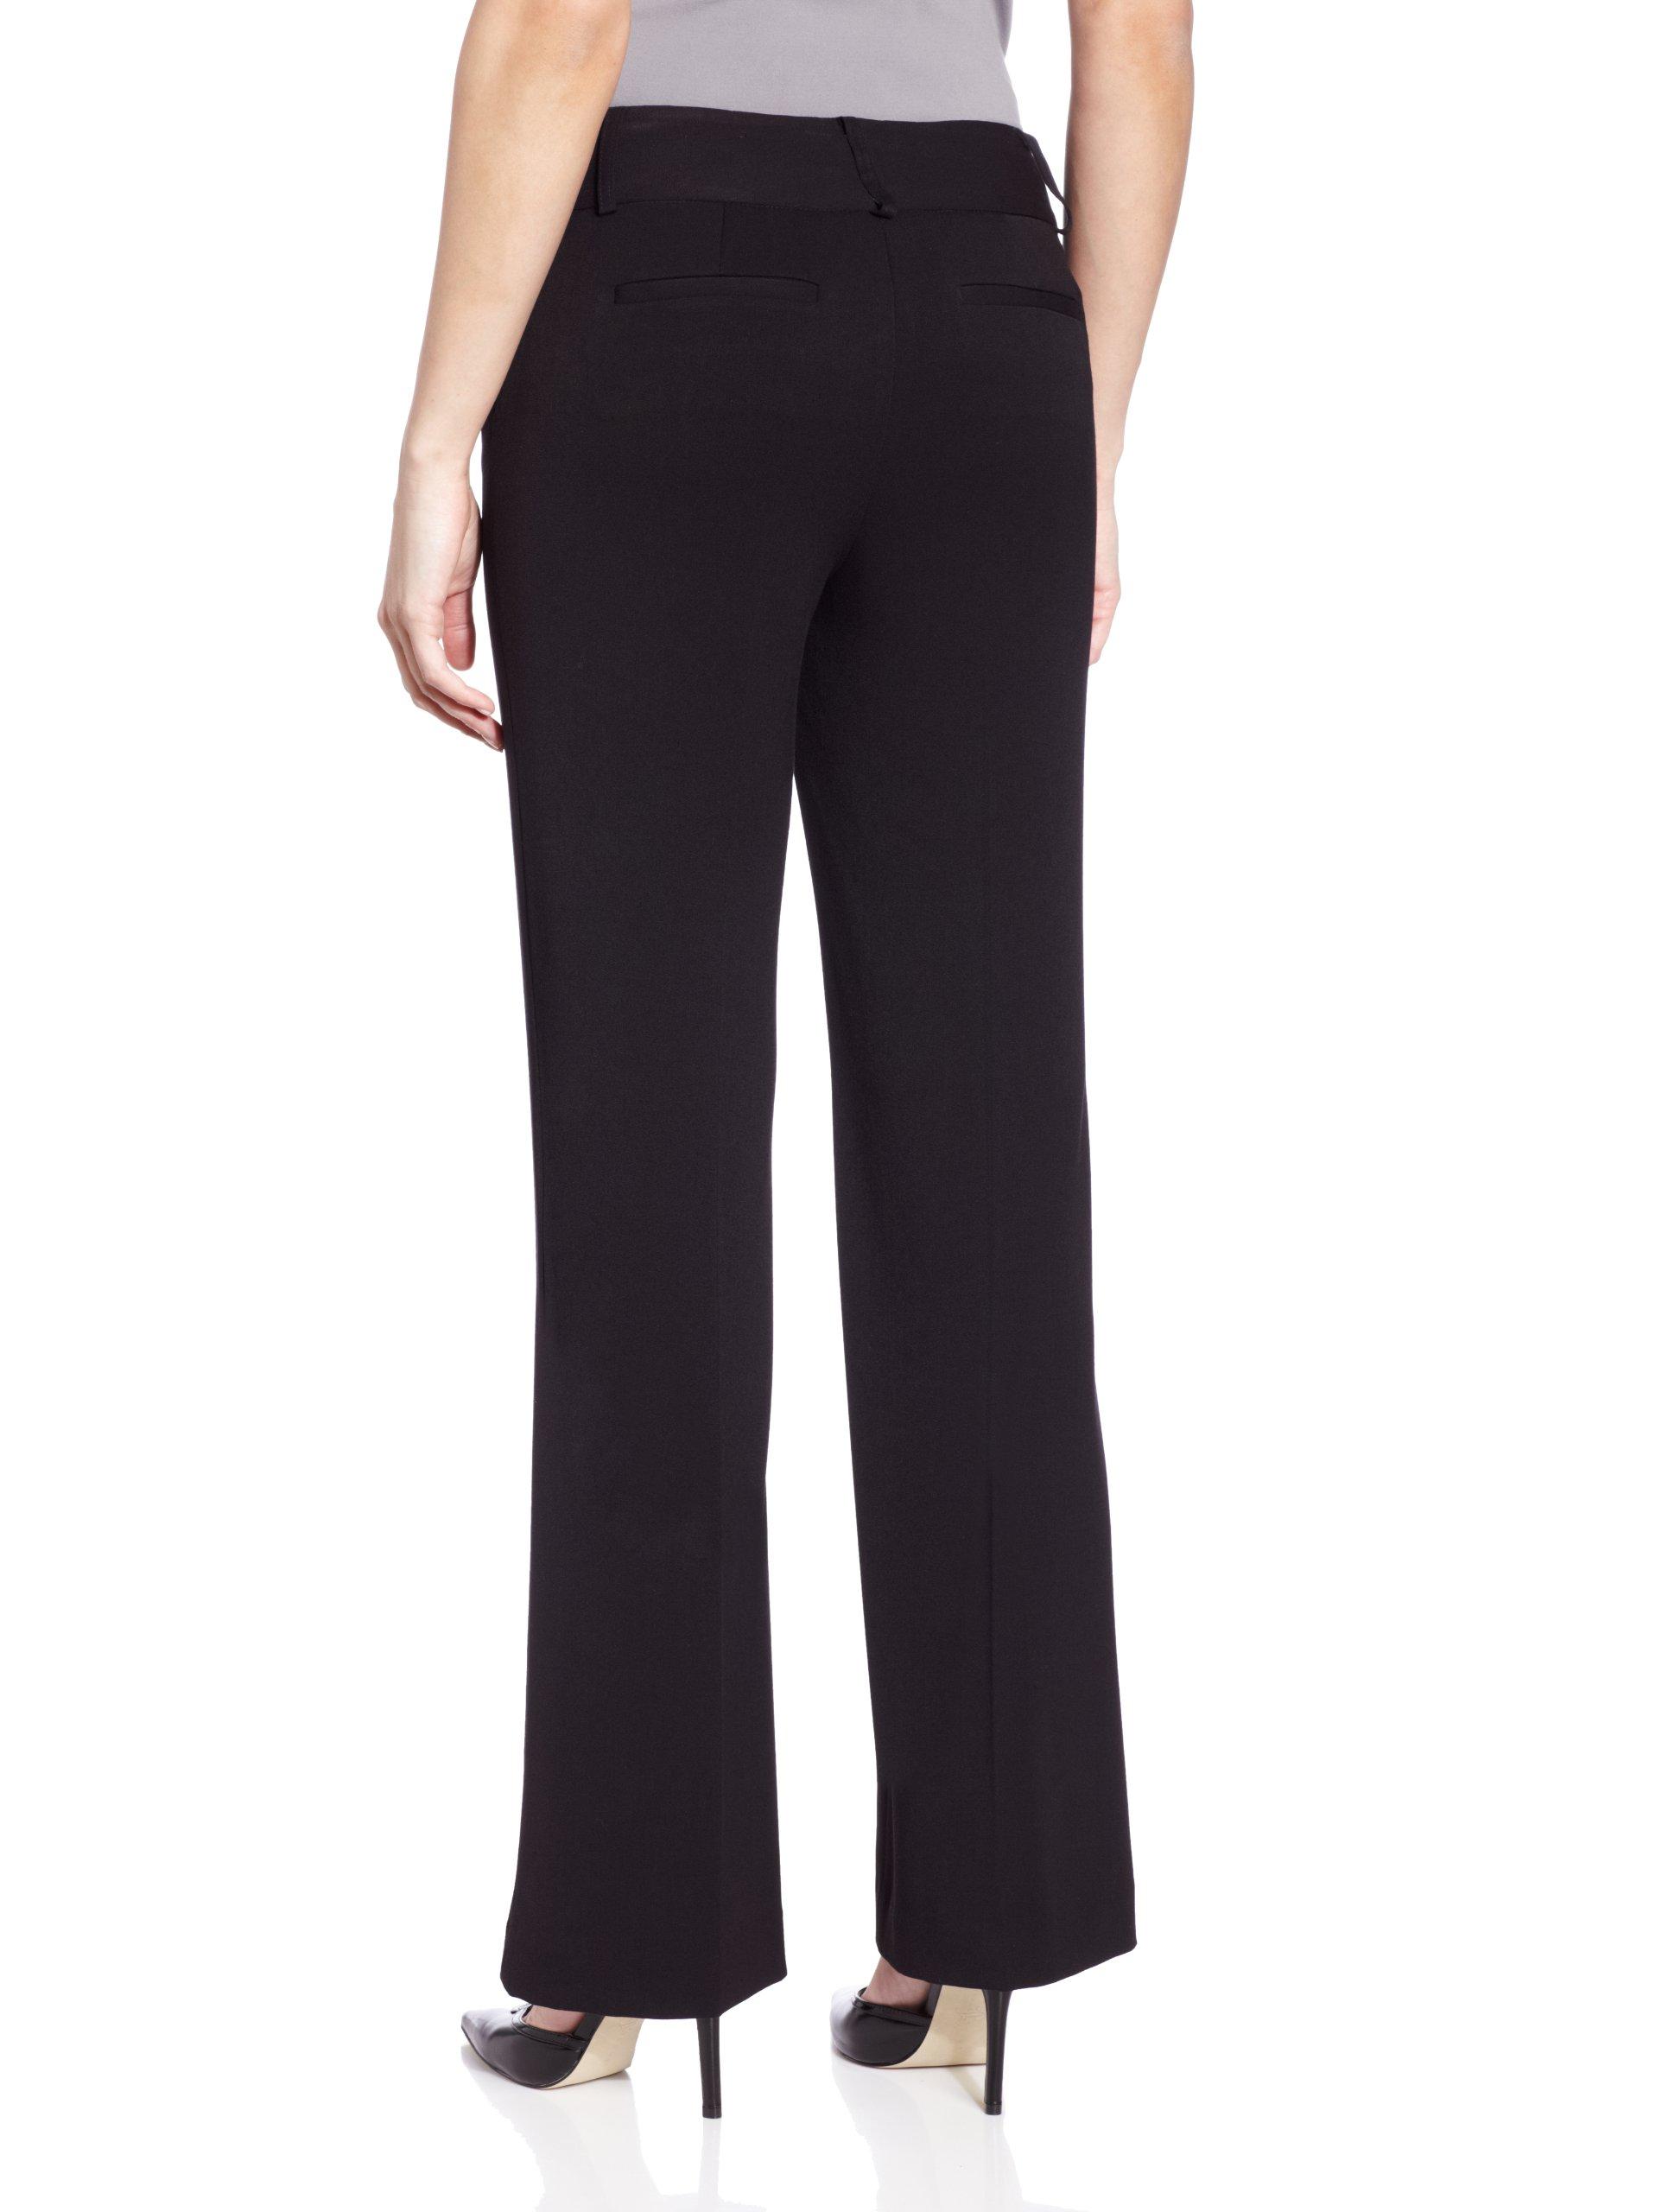 Rafaella Women's Curvy Fit Pant, Black, 14 by Rafaella (Image #2)